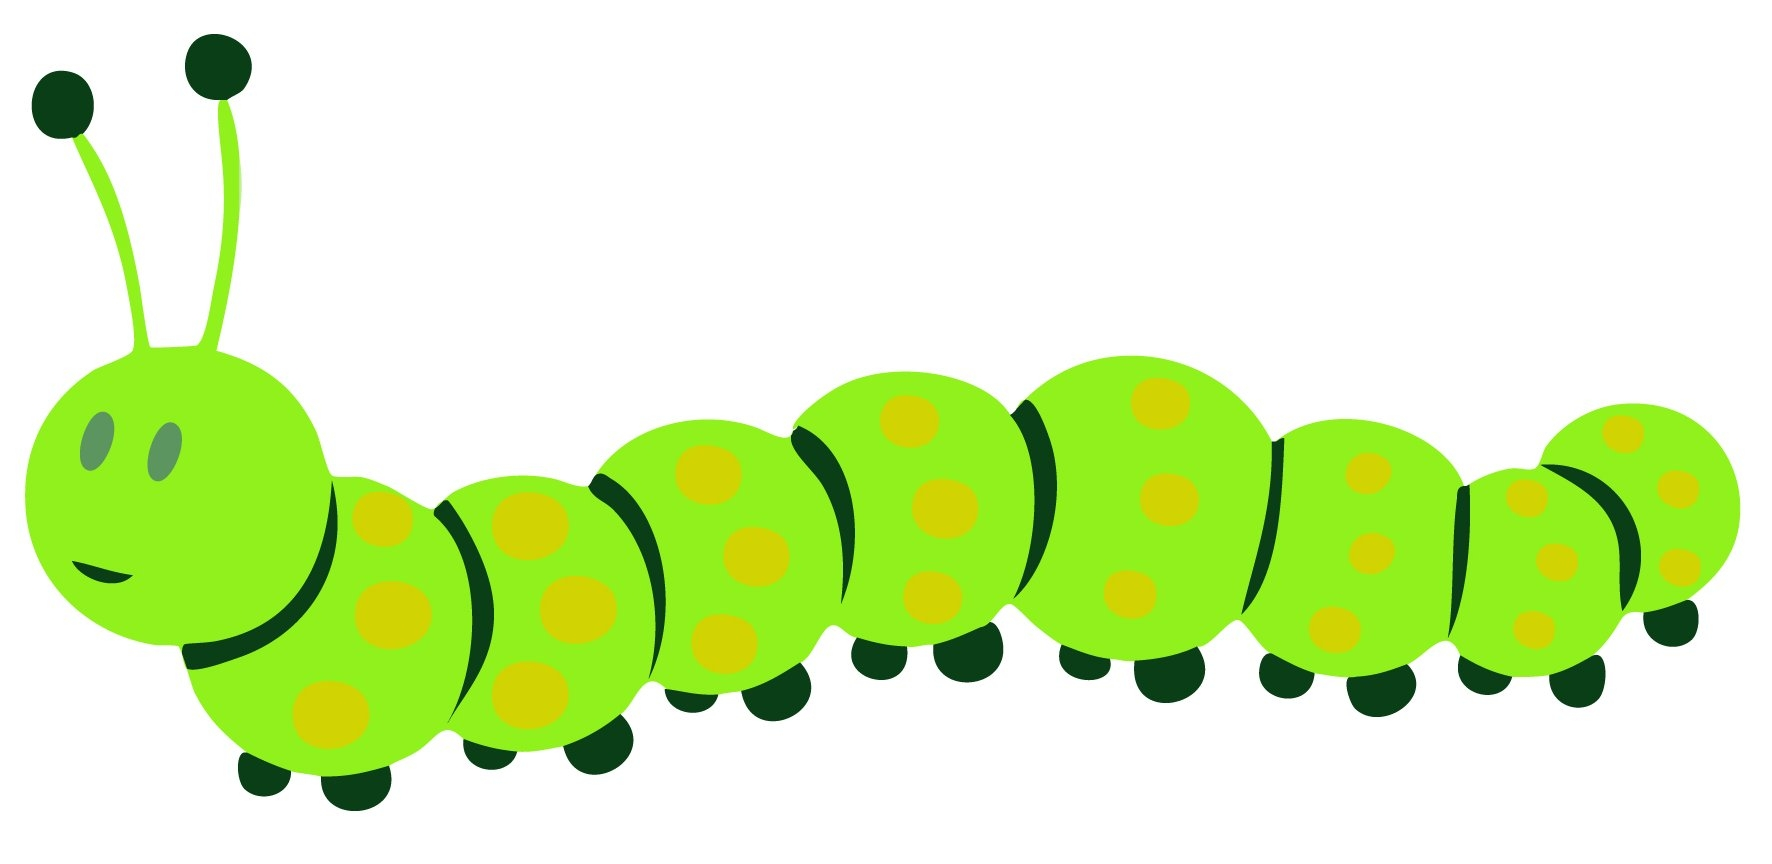 caterpillar clipart at getdrawings com free for personal use rh getdrawings com clipart caterpillar cocoon clipart caterpillar butterfly